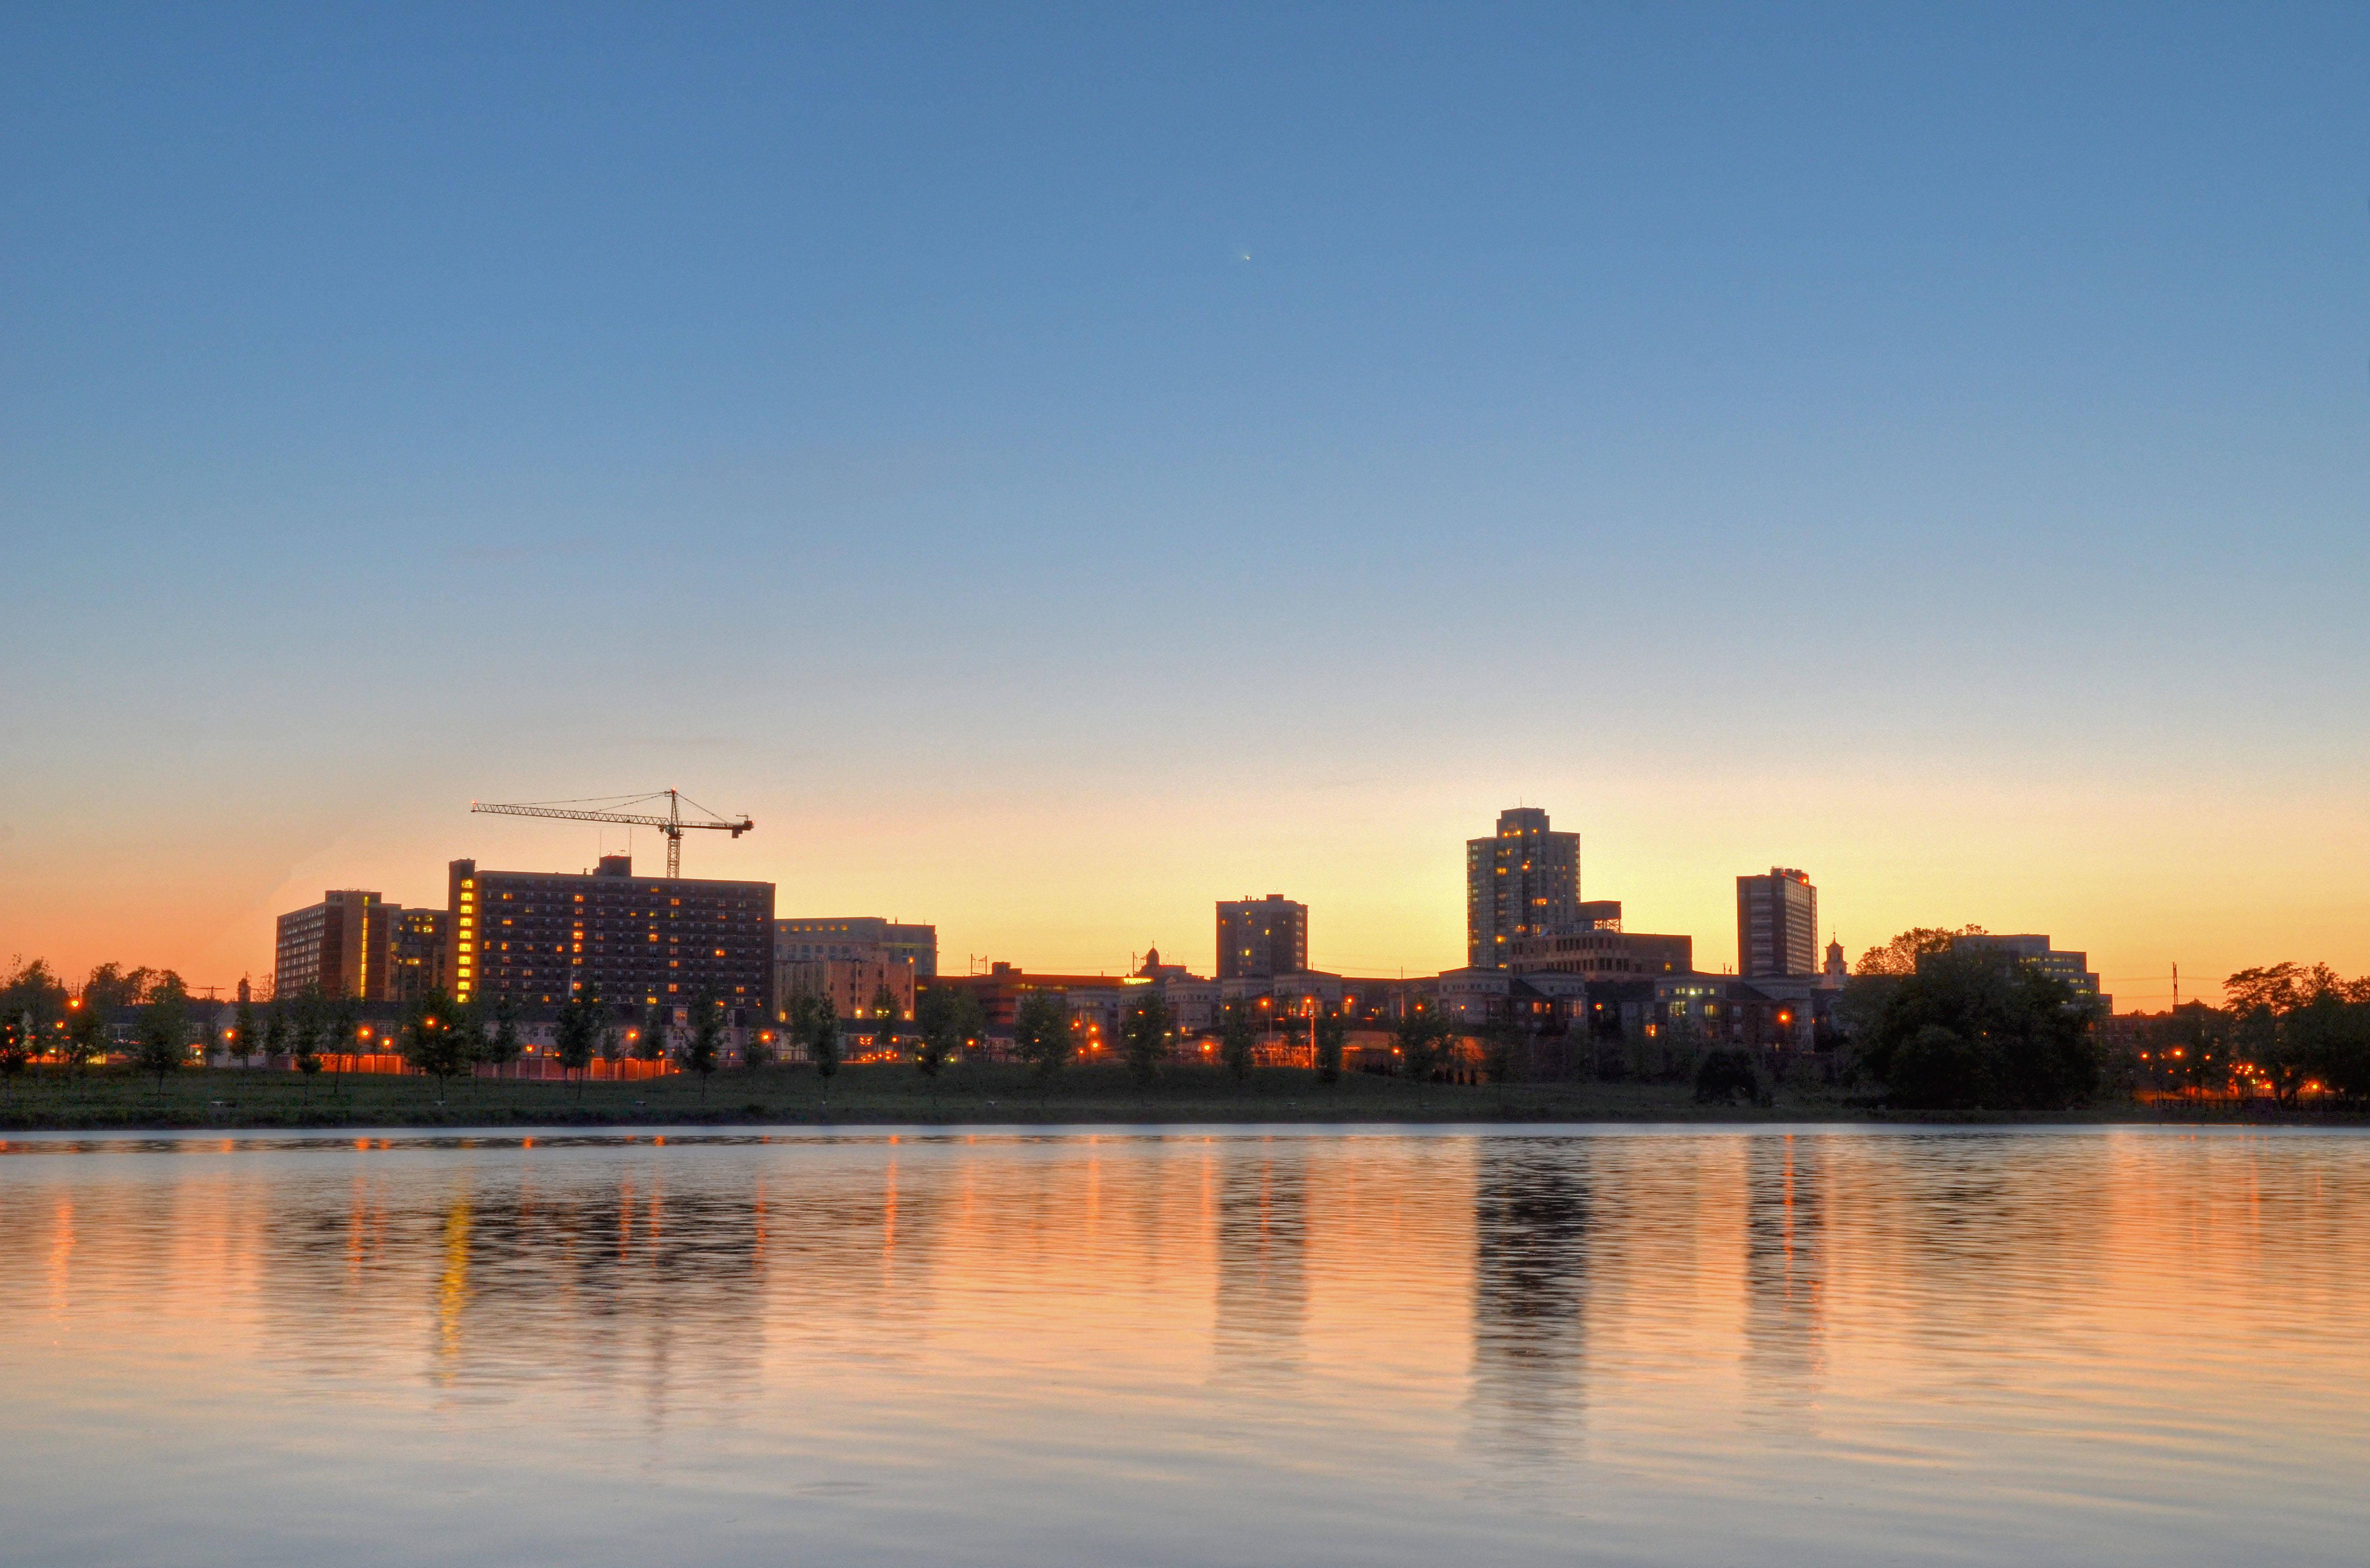 ed084e0f0438acf74235_New_Brunswick_NJ_Skyline_at_Sunset.jpg